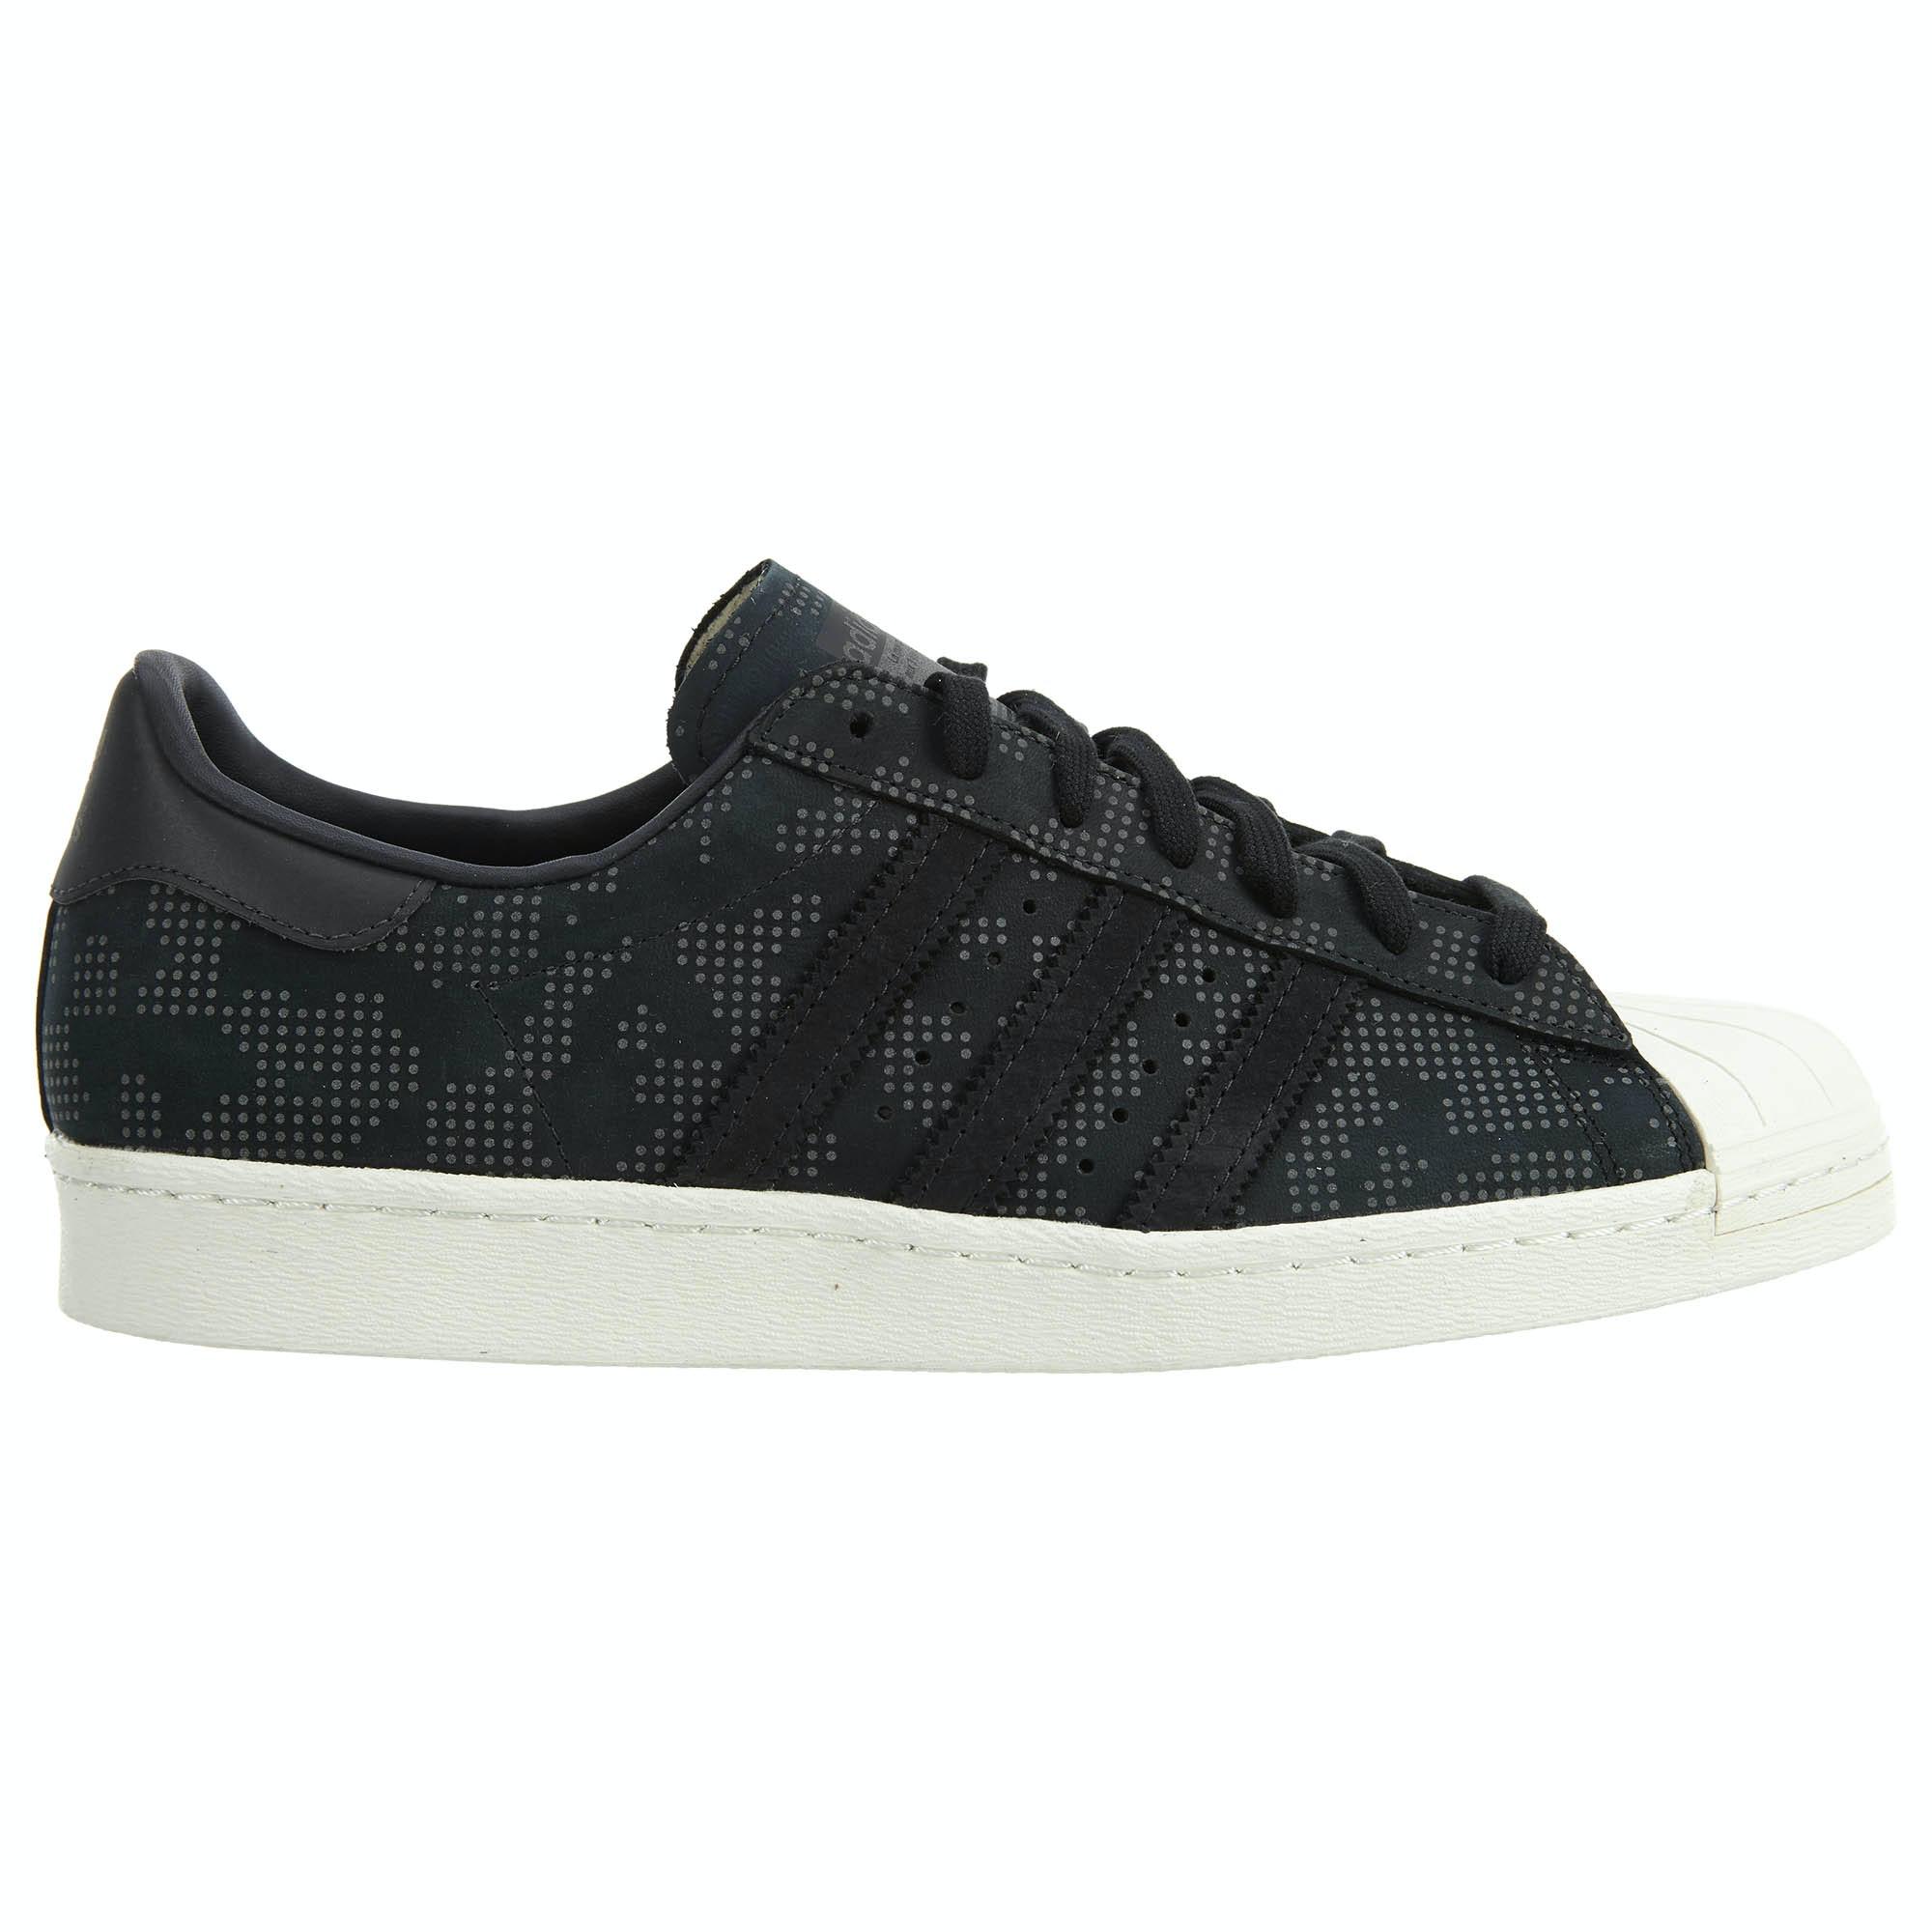 adidas Superstar 80s Camo 15 Cblack/Owhite